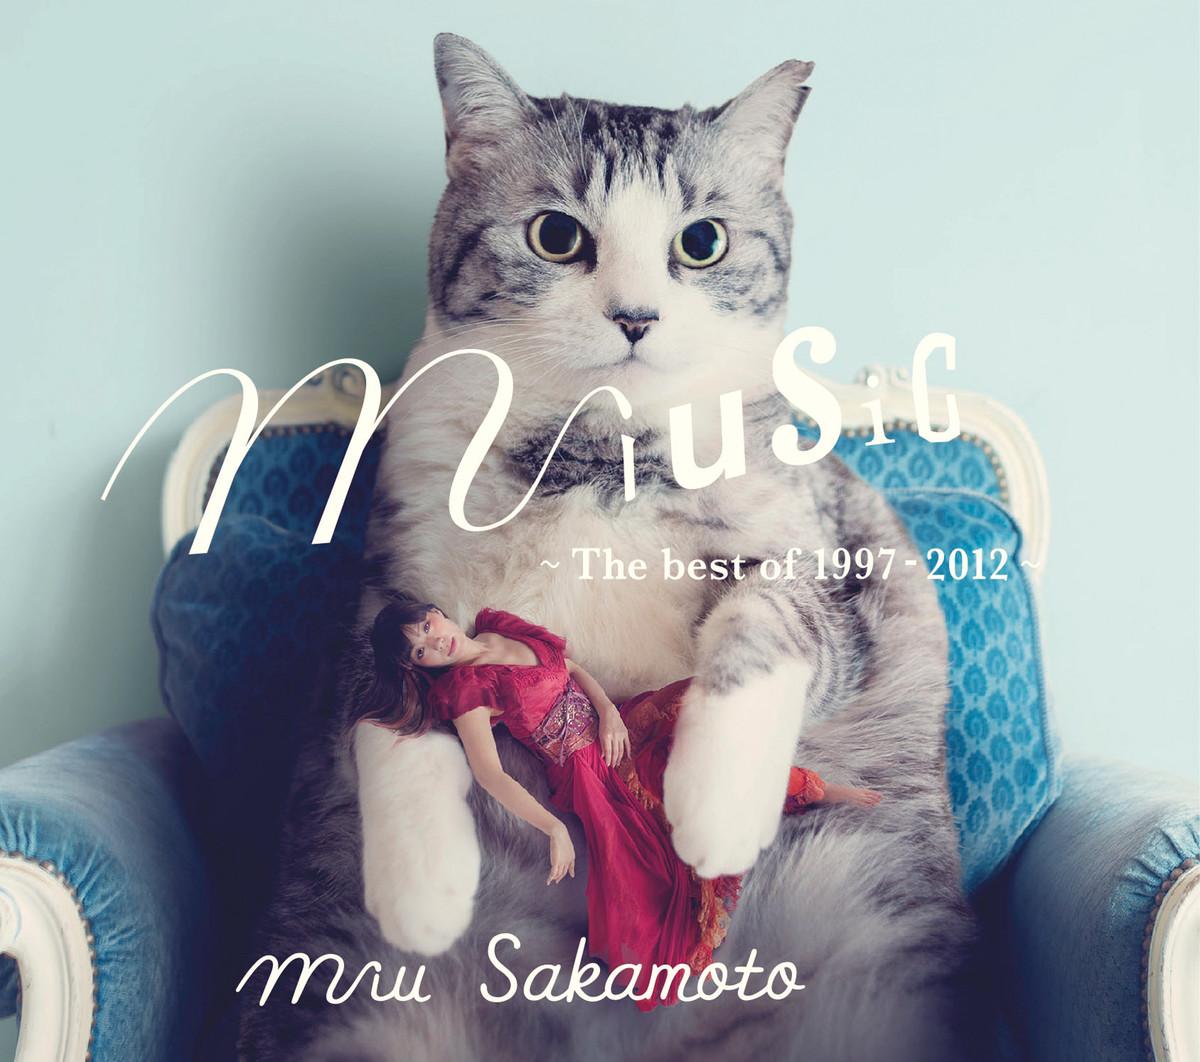 20170820.0956.3 Miu Sakamoto - Miusic ~The best of 1997-2012~ cover.jpg